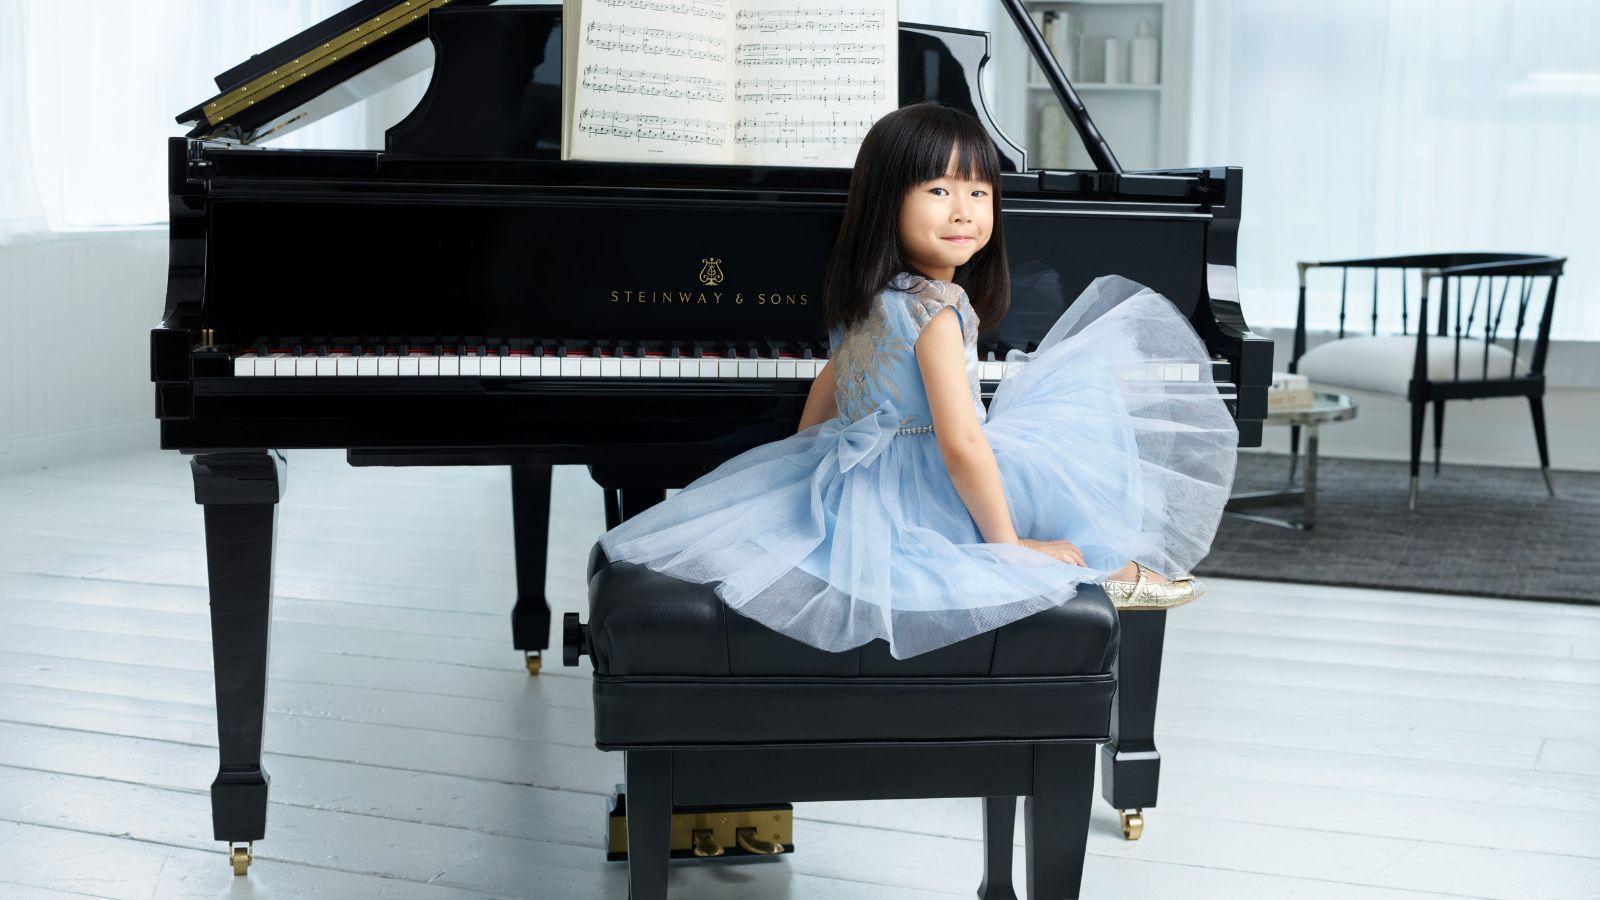 Steinway Pianos 5